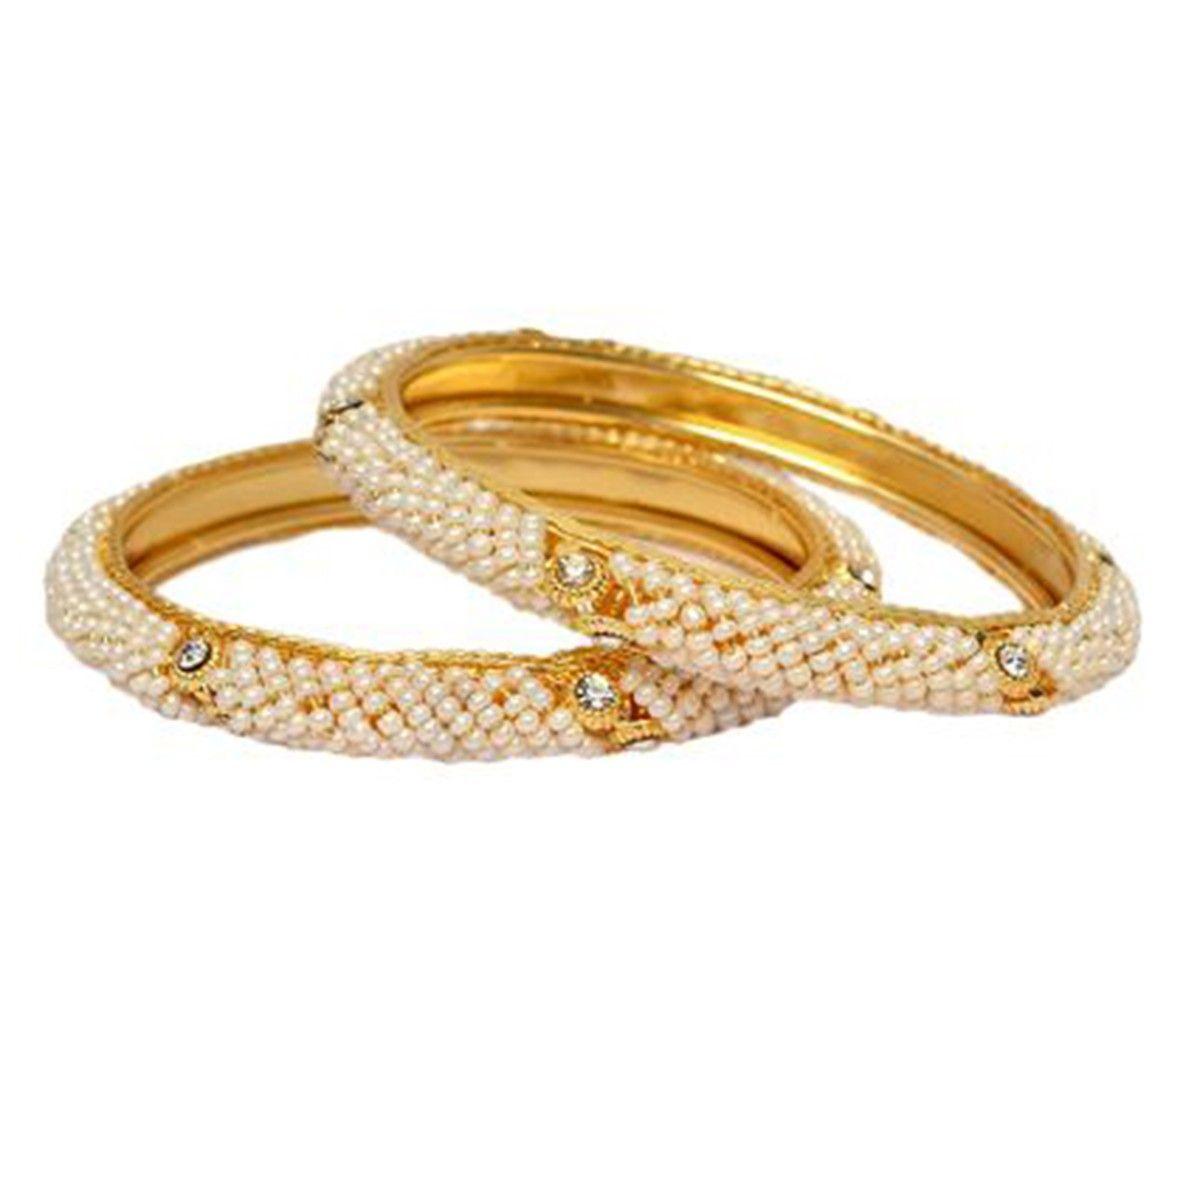 Alloy golden bangles bgl bangle free shipping and ships